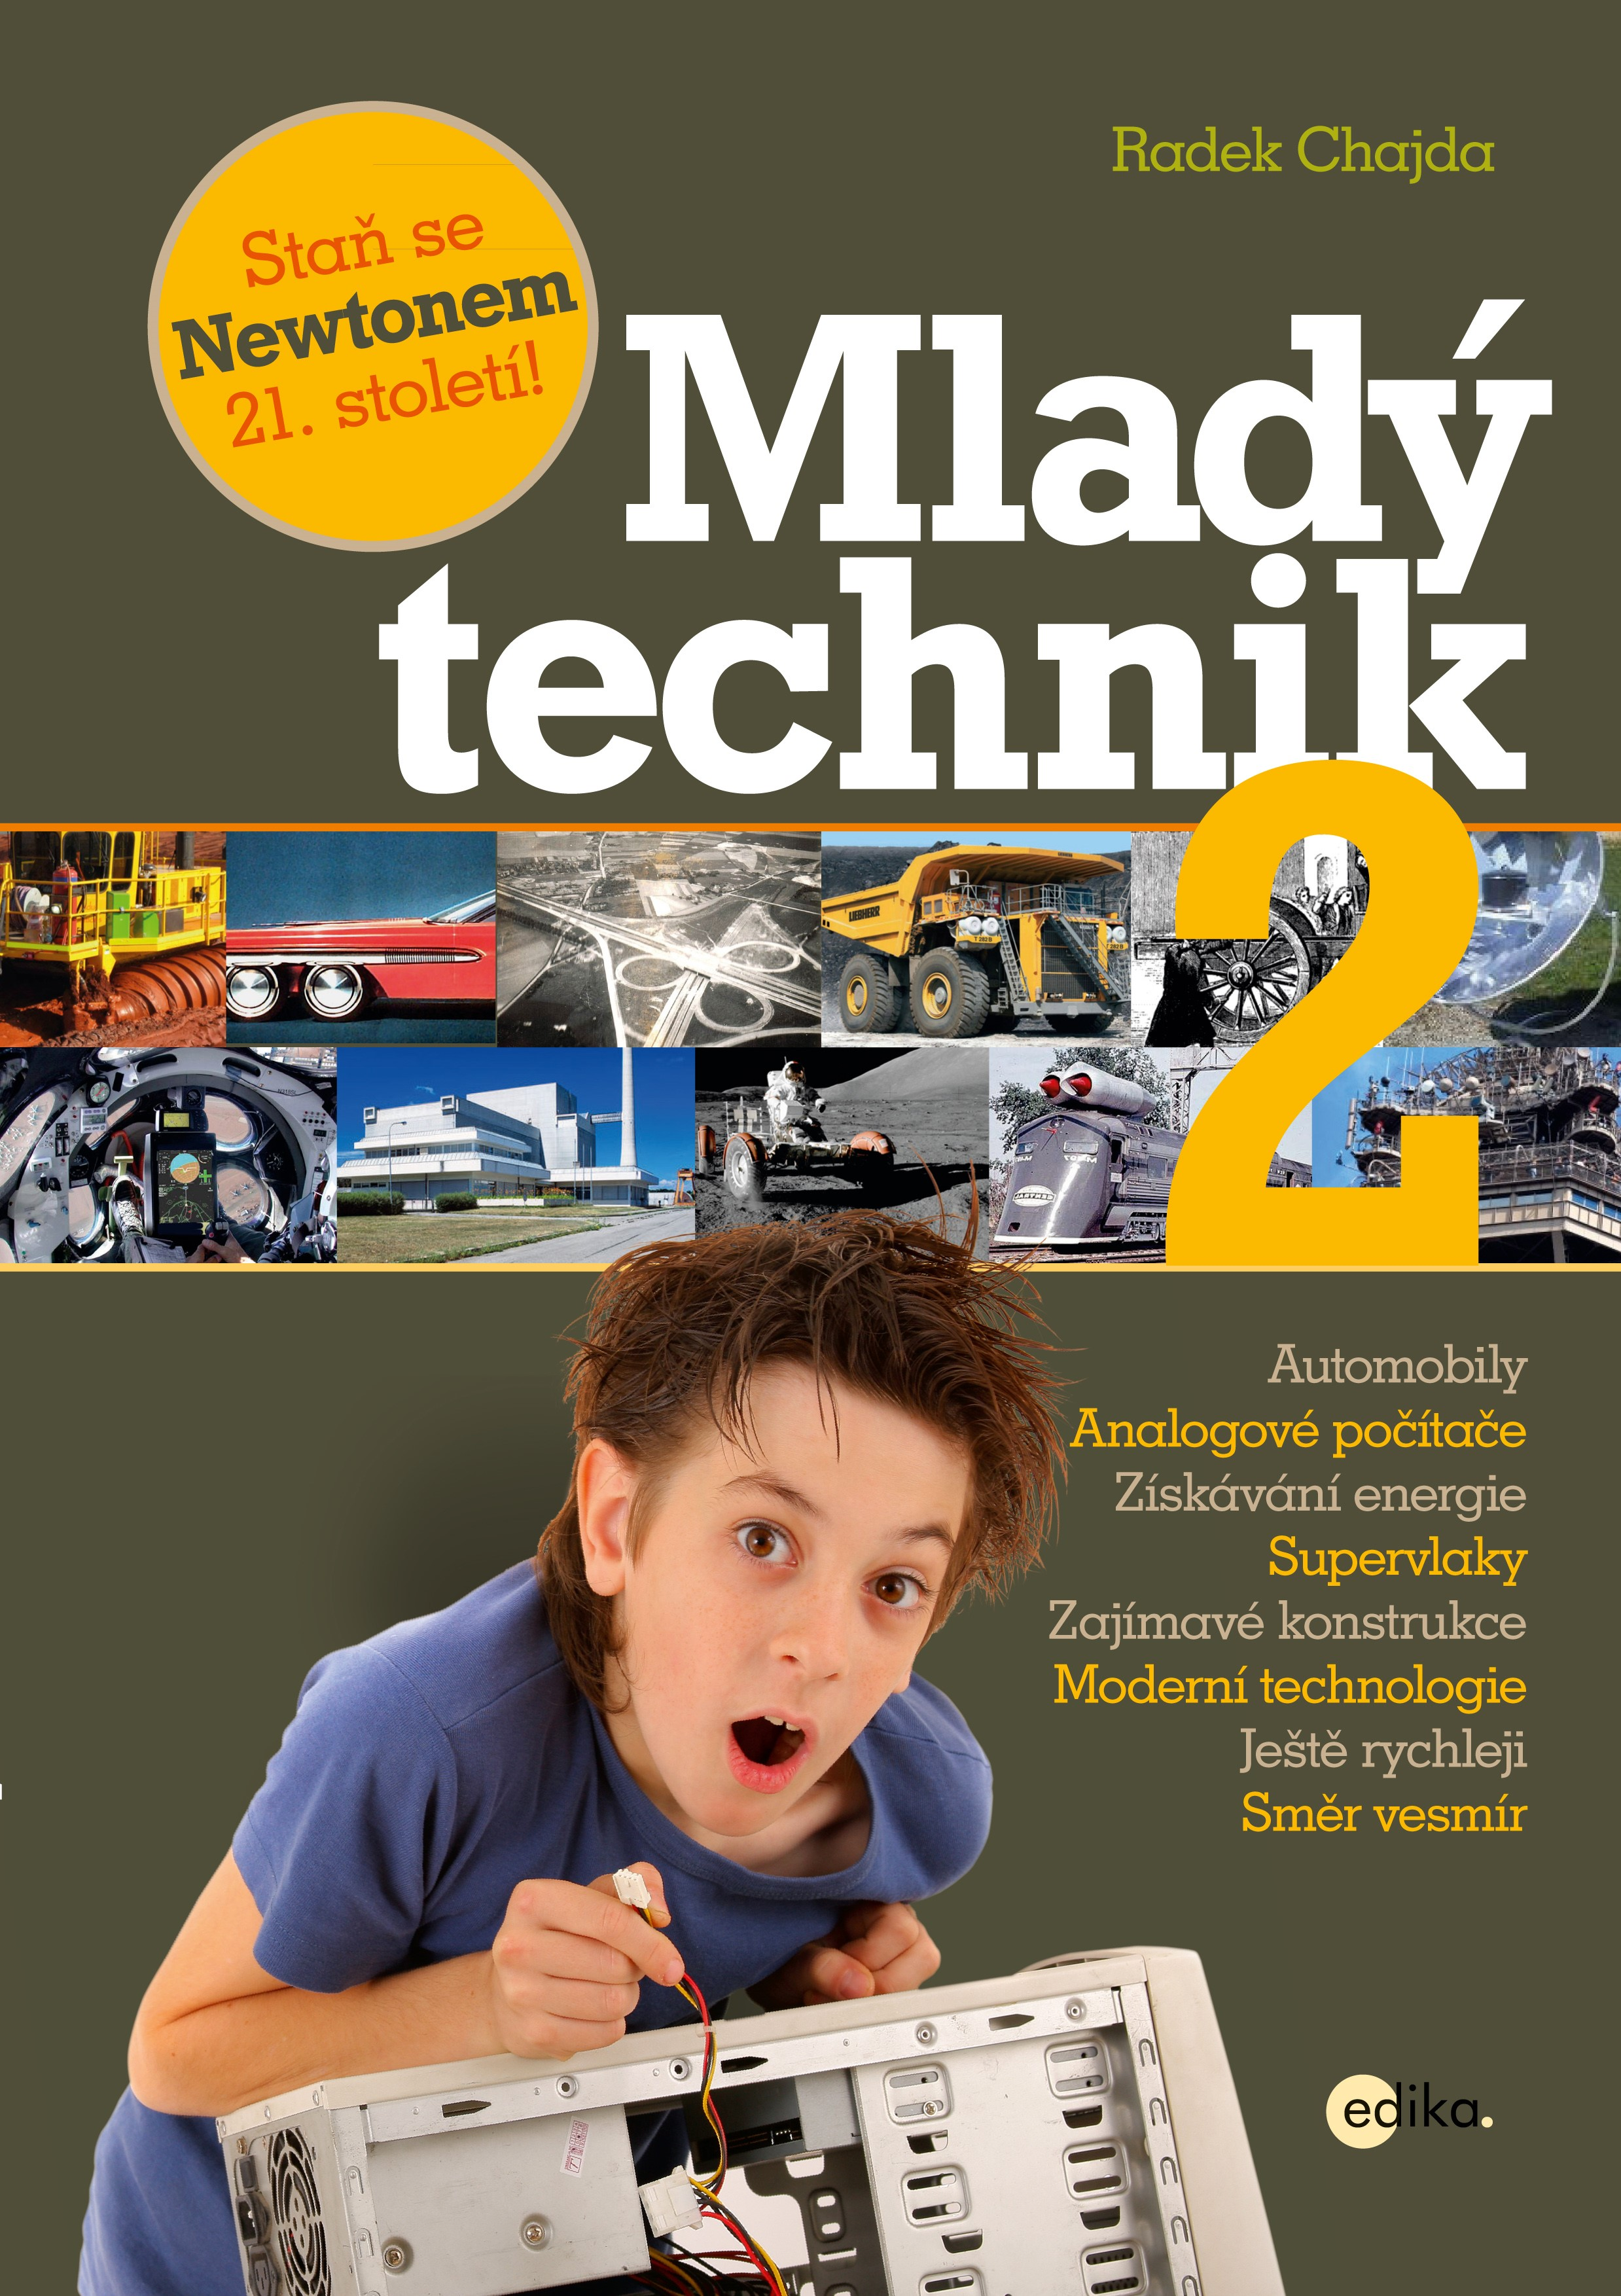 Mladý technik 2 | Radek Chajda